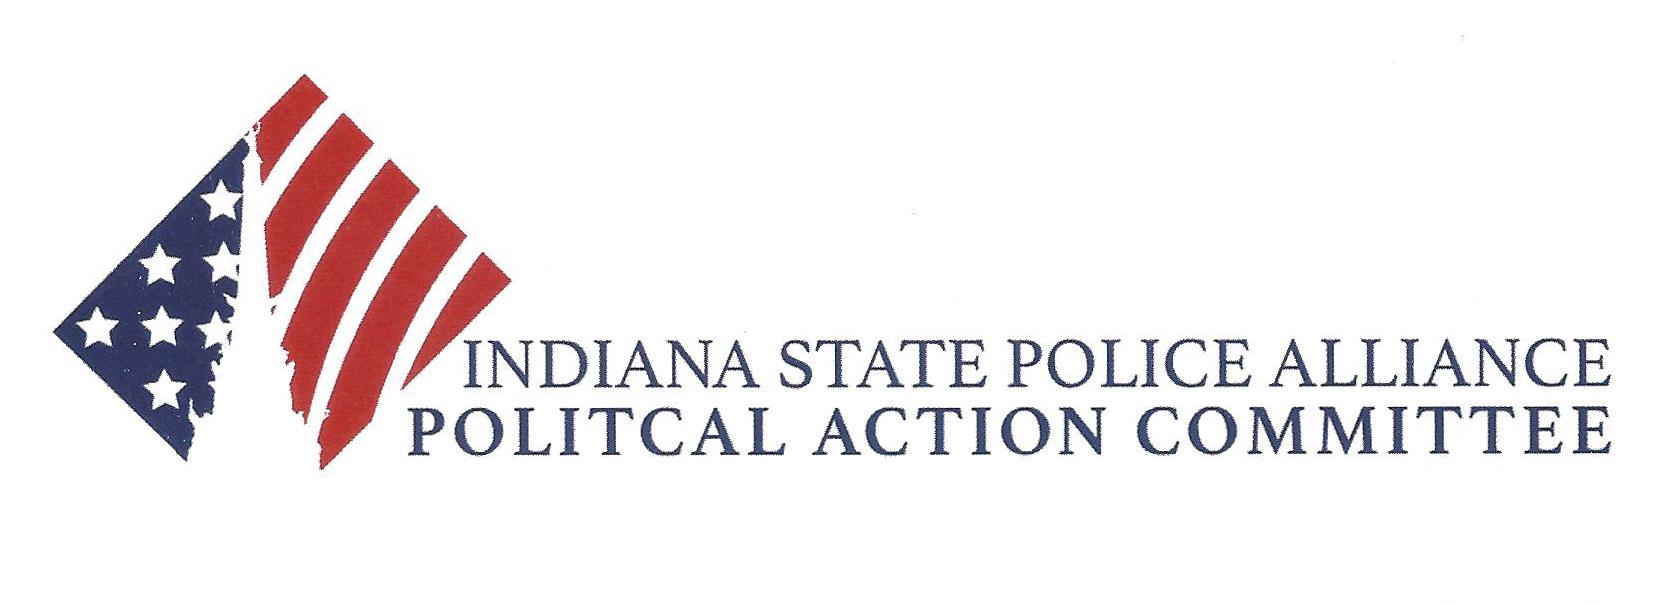 ISPA logo.jpg